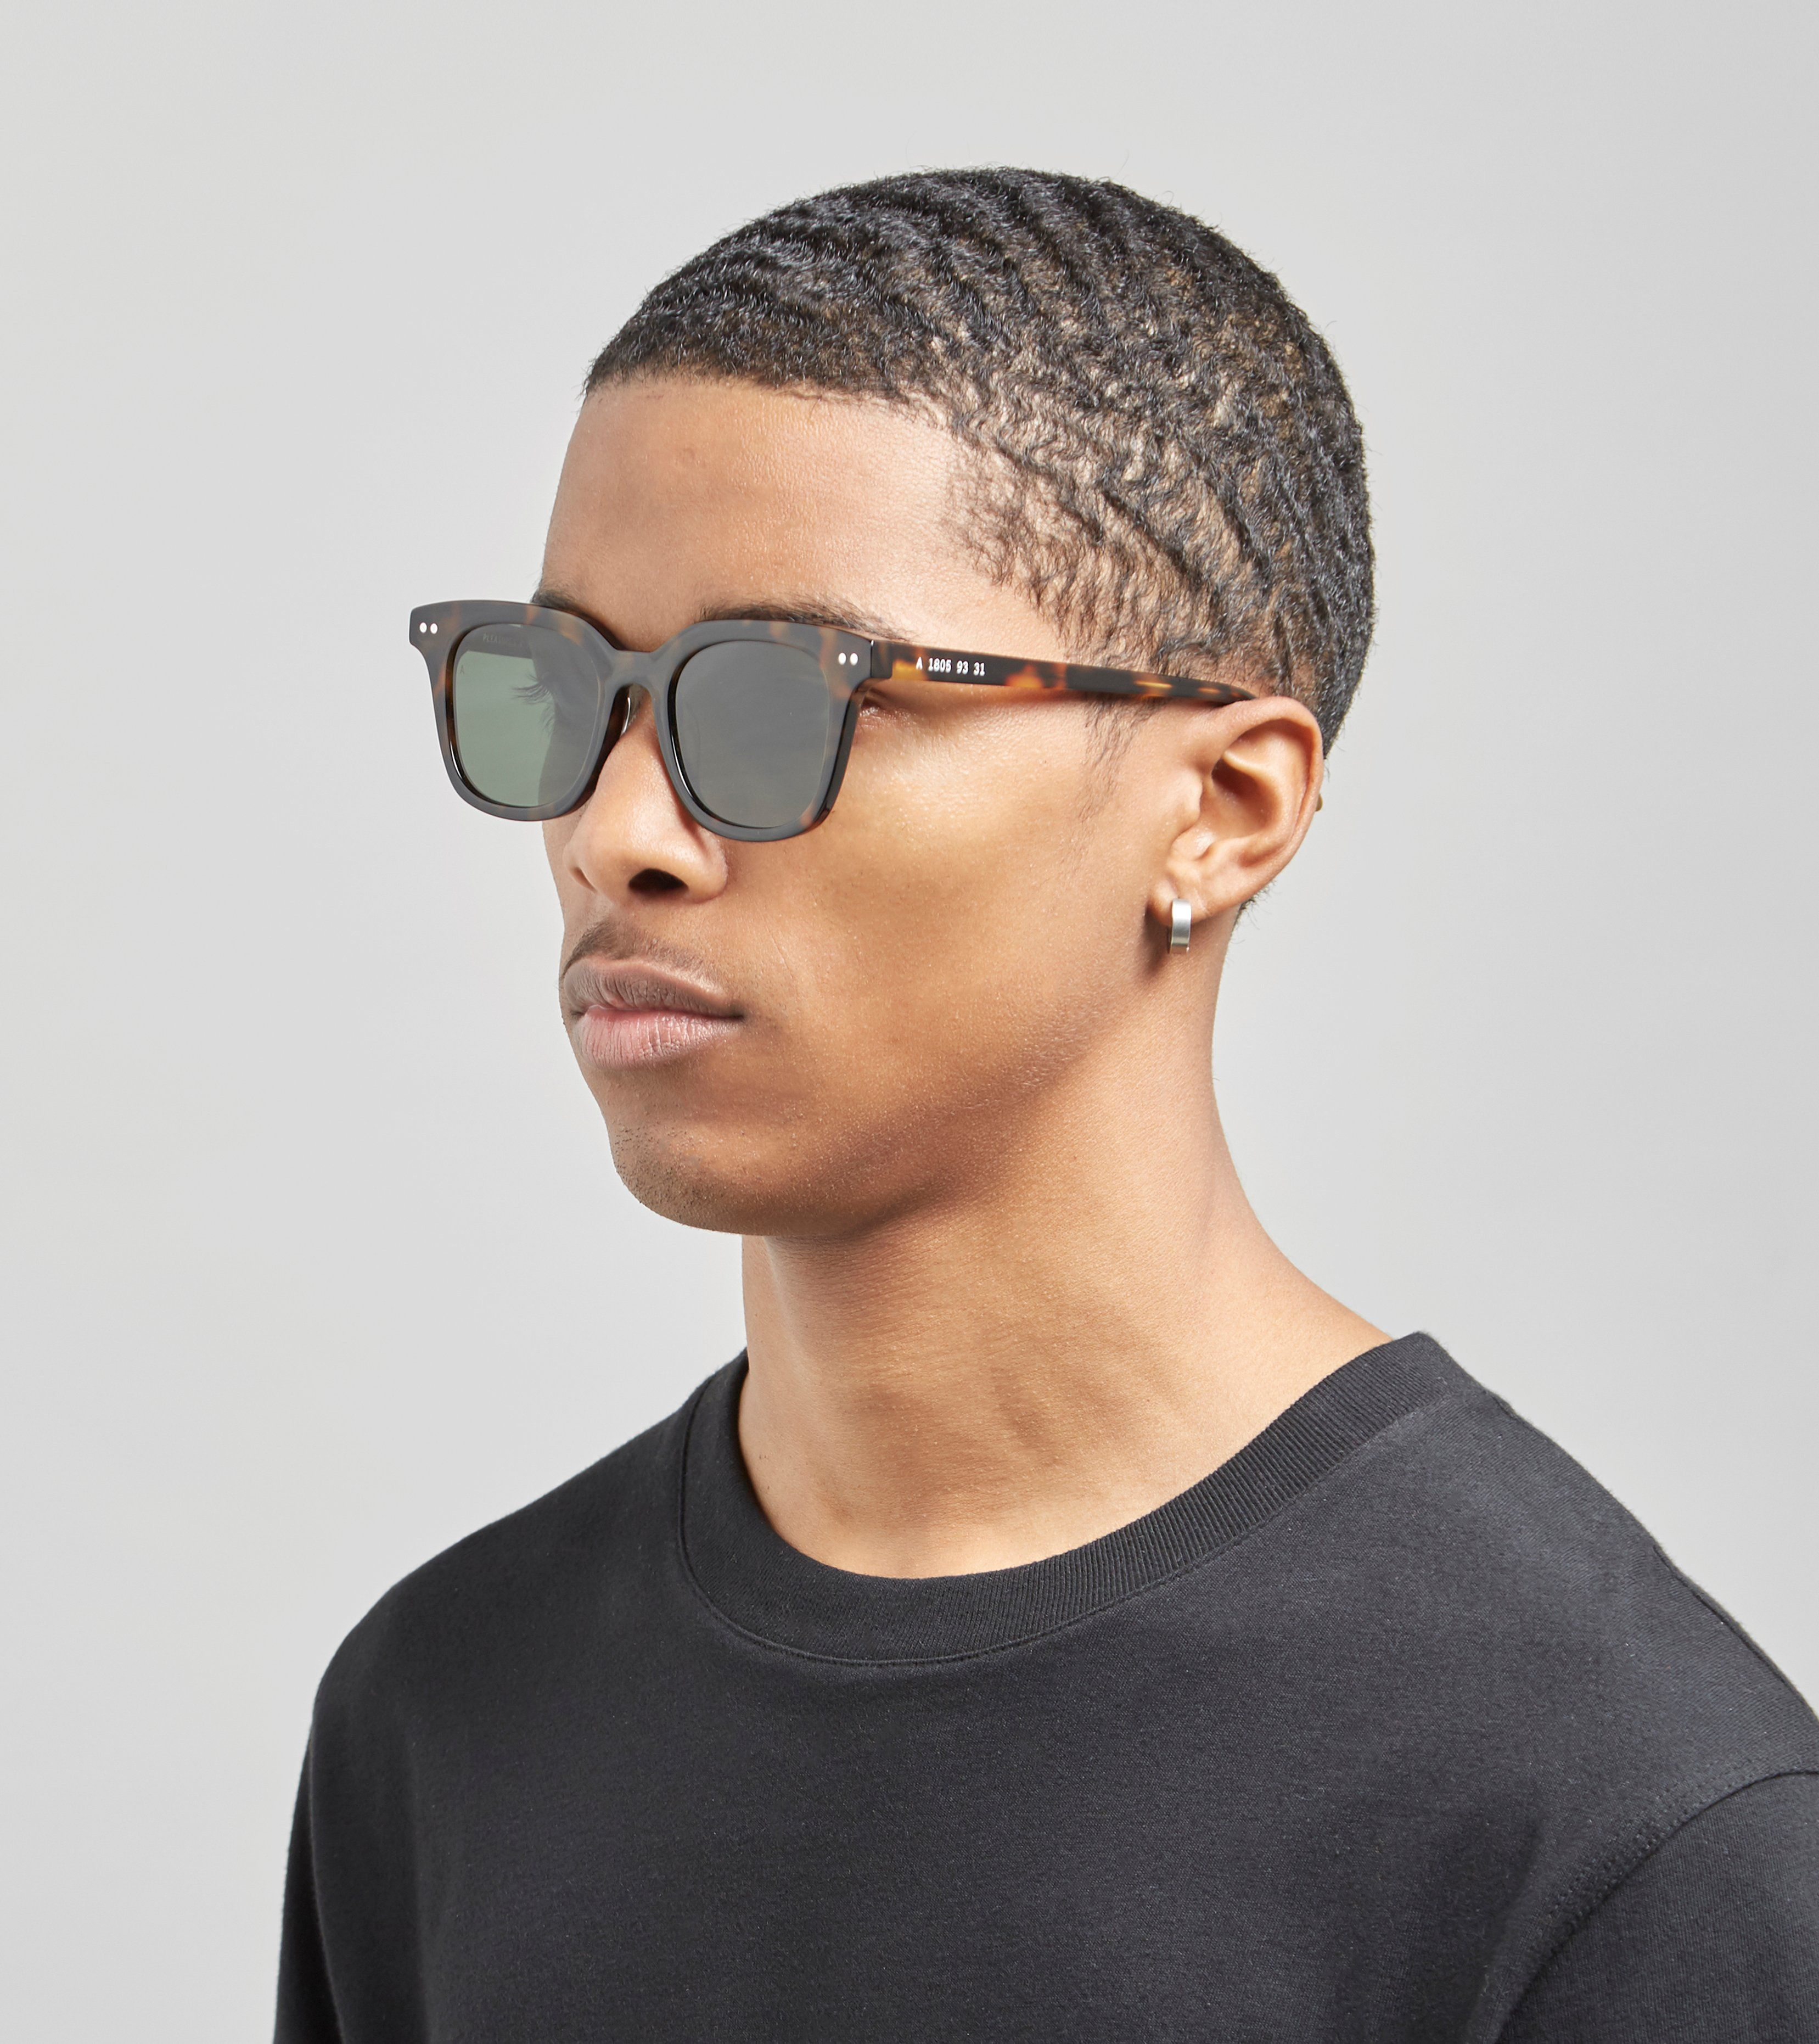 PLEASURES Hi-Fi Sunglasses (Daytime)